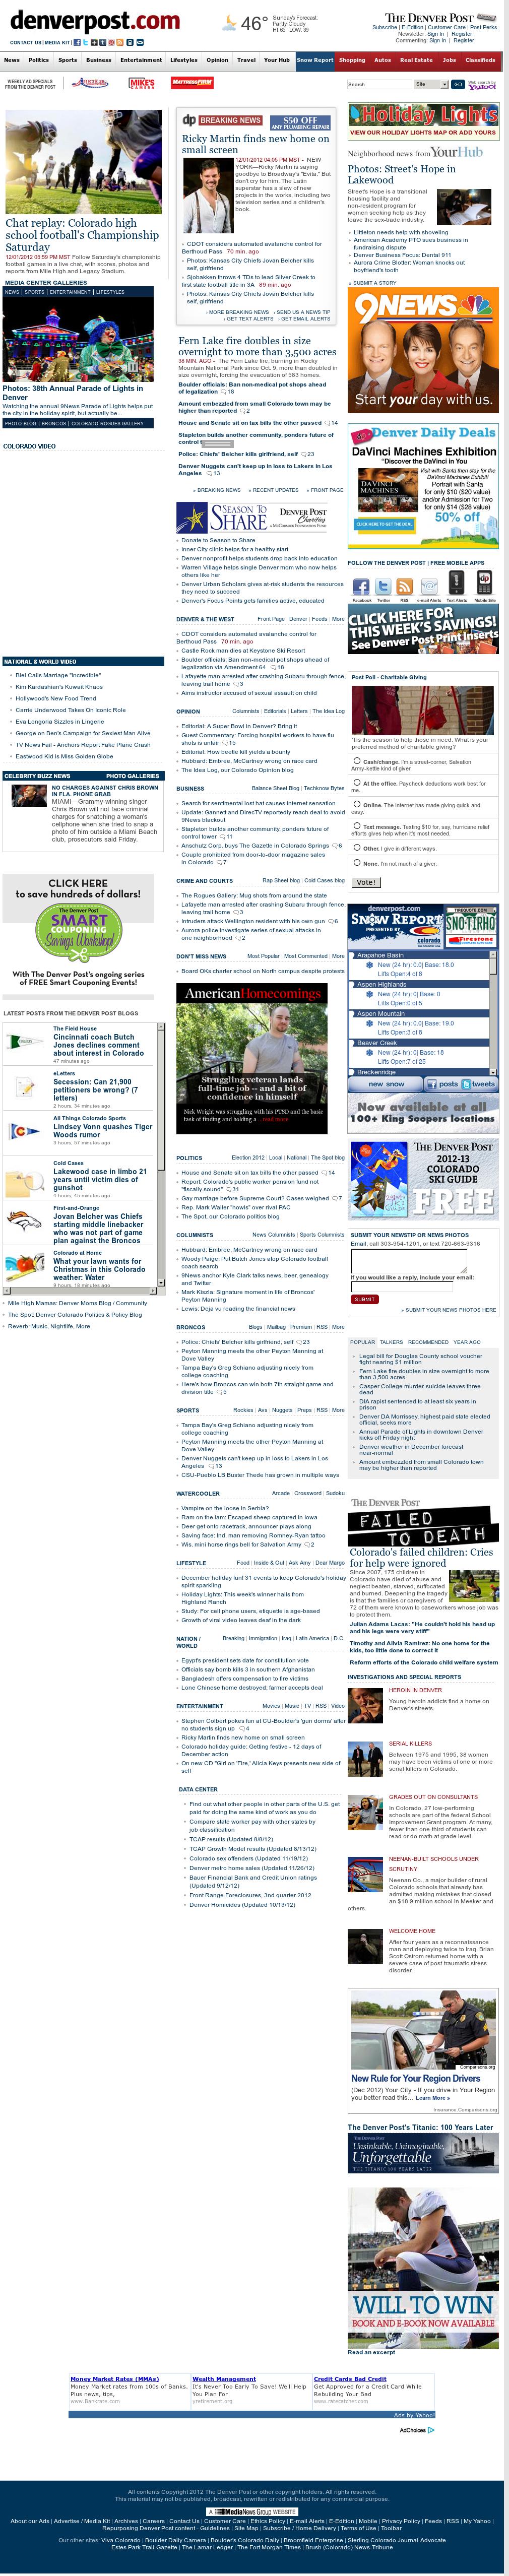 Denver Post at Sunday Dec. 2, 2012, 3:06 a.m. UTC